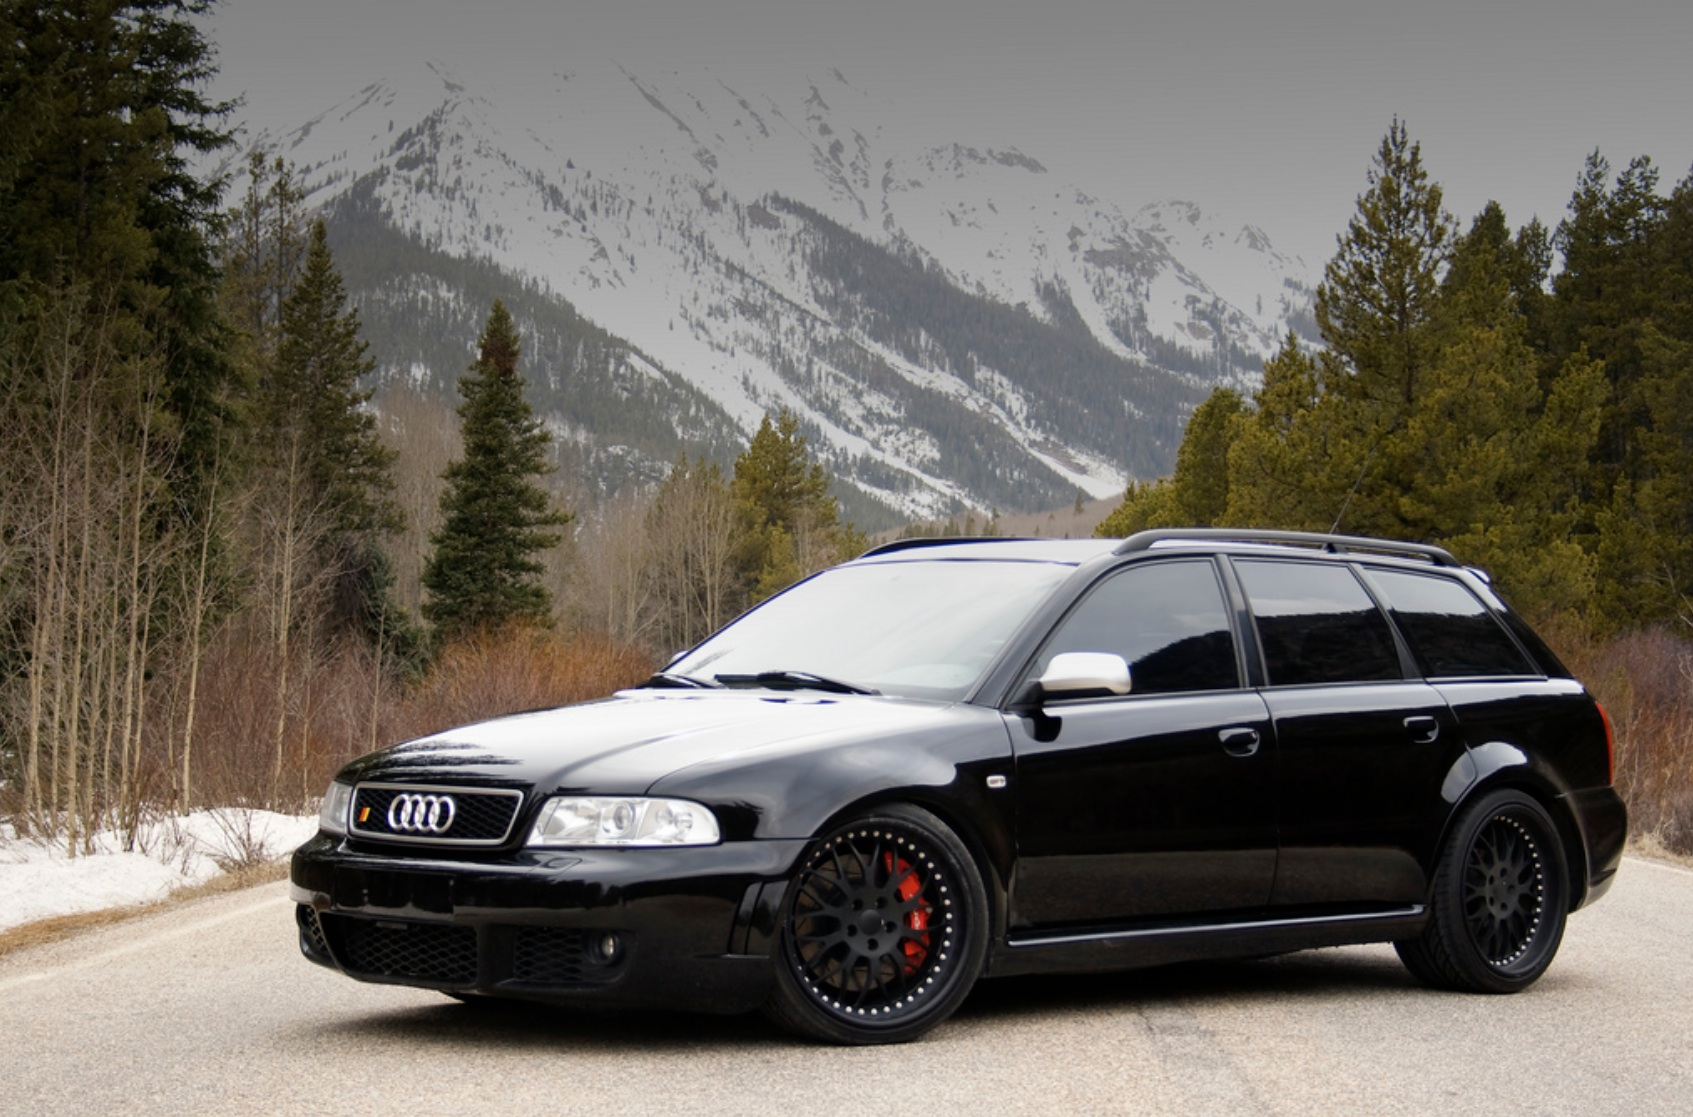 Audi S4 I (B5) 1997 - 2001 Sedan #2